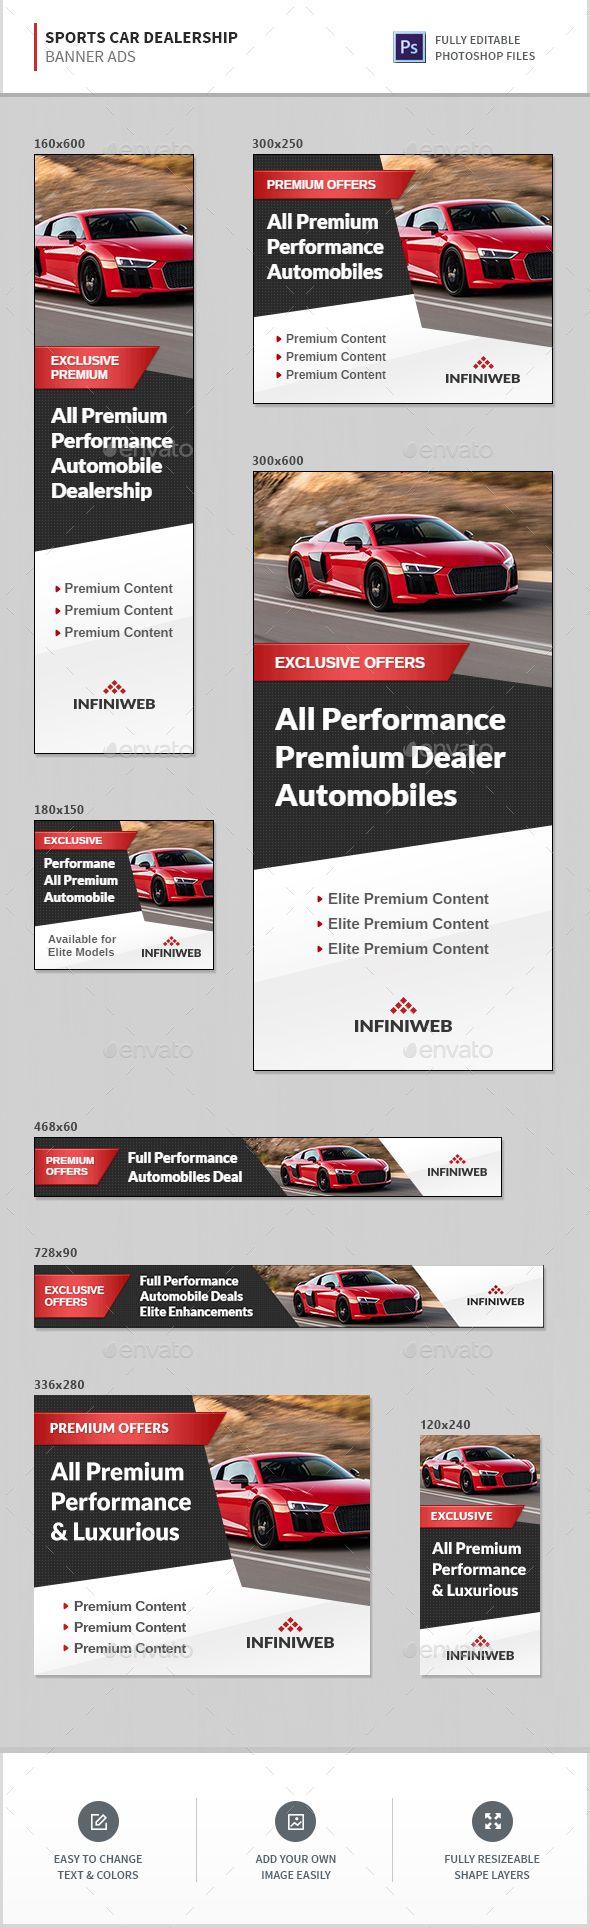 Sports Car Dealership Banners